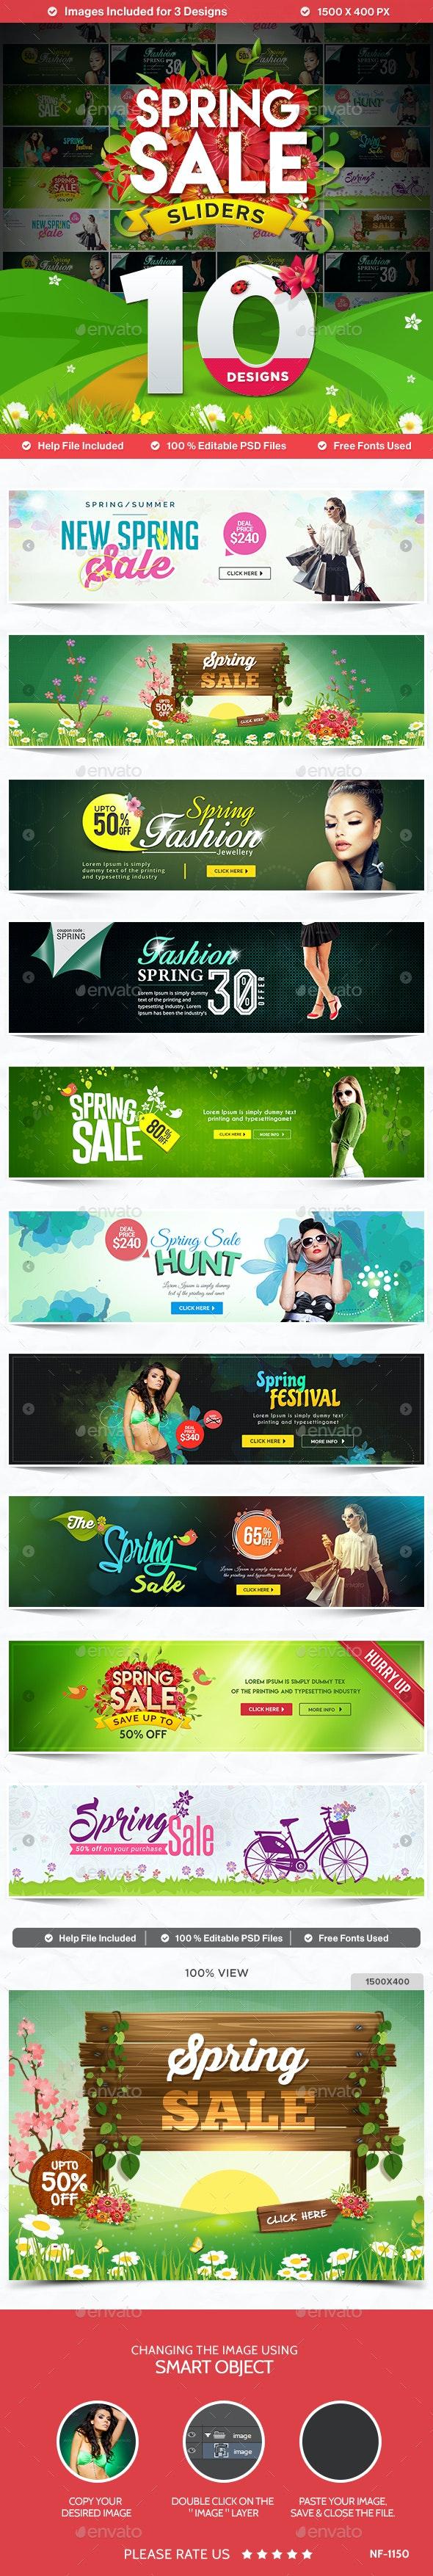 Spring Sale Sliders - 10 Designs - Sliders & Features Web Elements